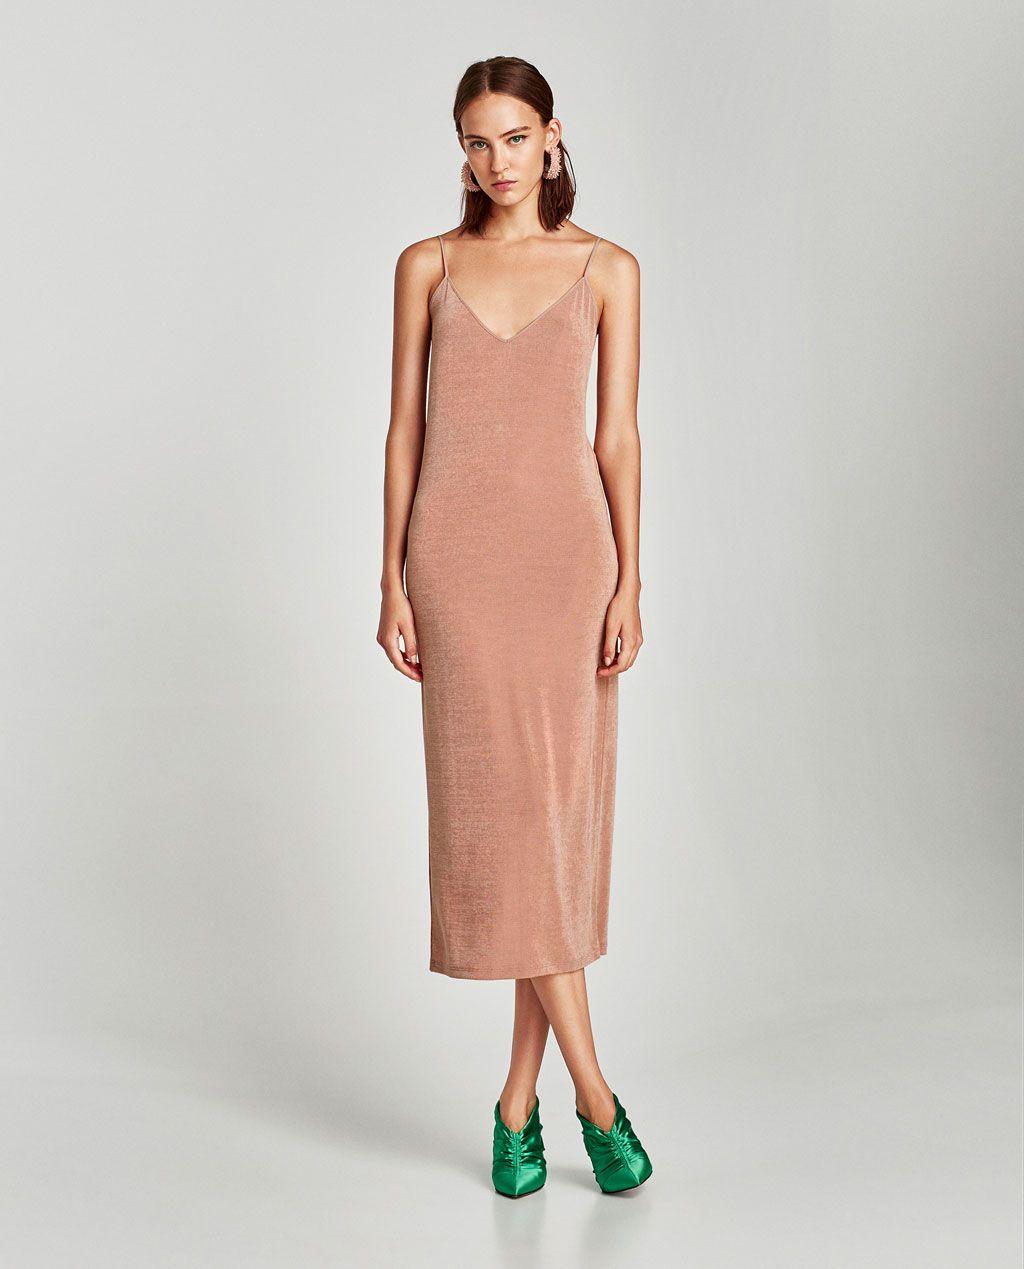 11c107f8d Imagen 1 de VESTIDO LARGO TIRANTES BRILLO de Zara   * Female Style ...